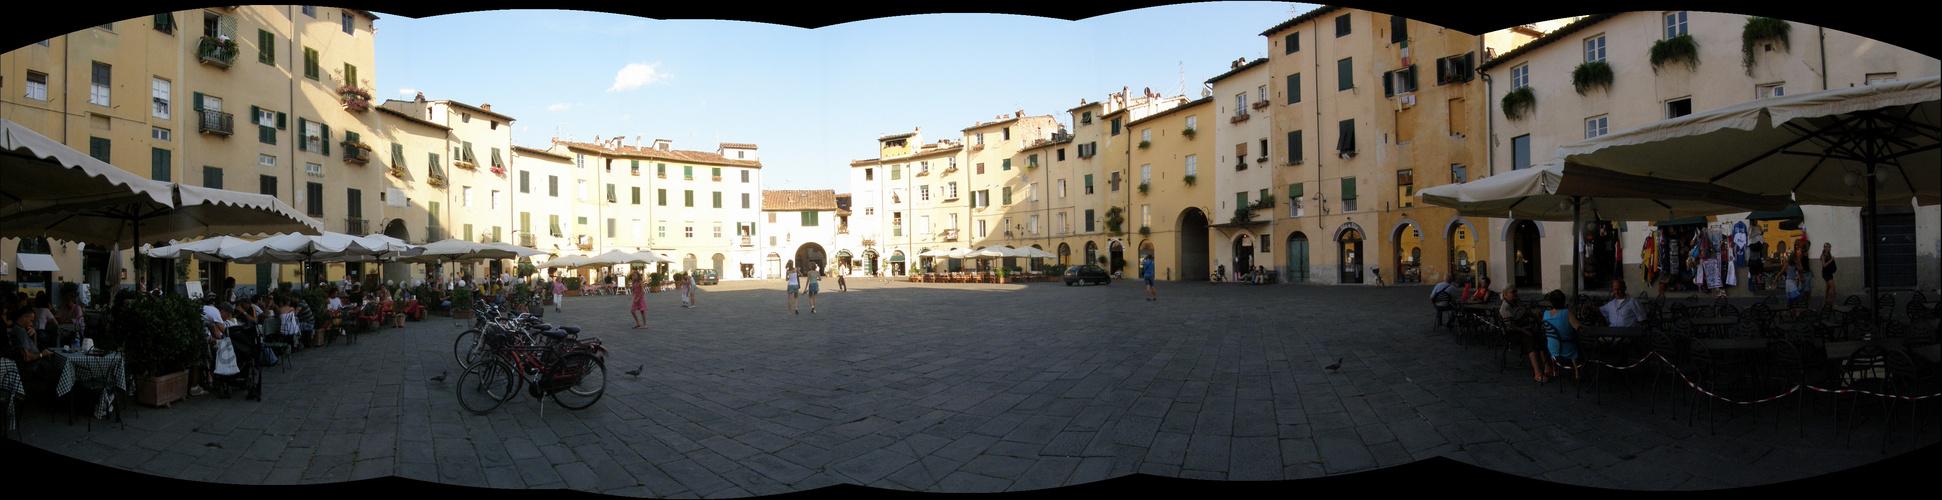 In giro per Lucca